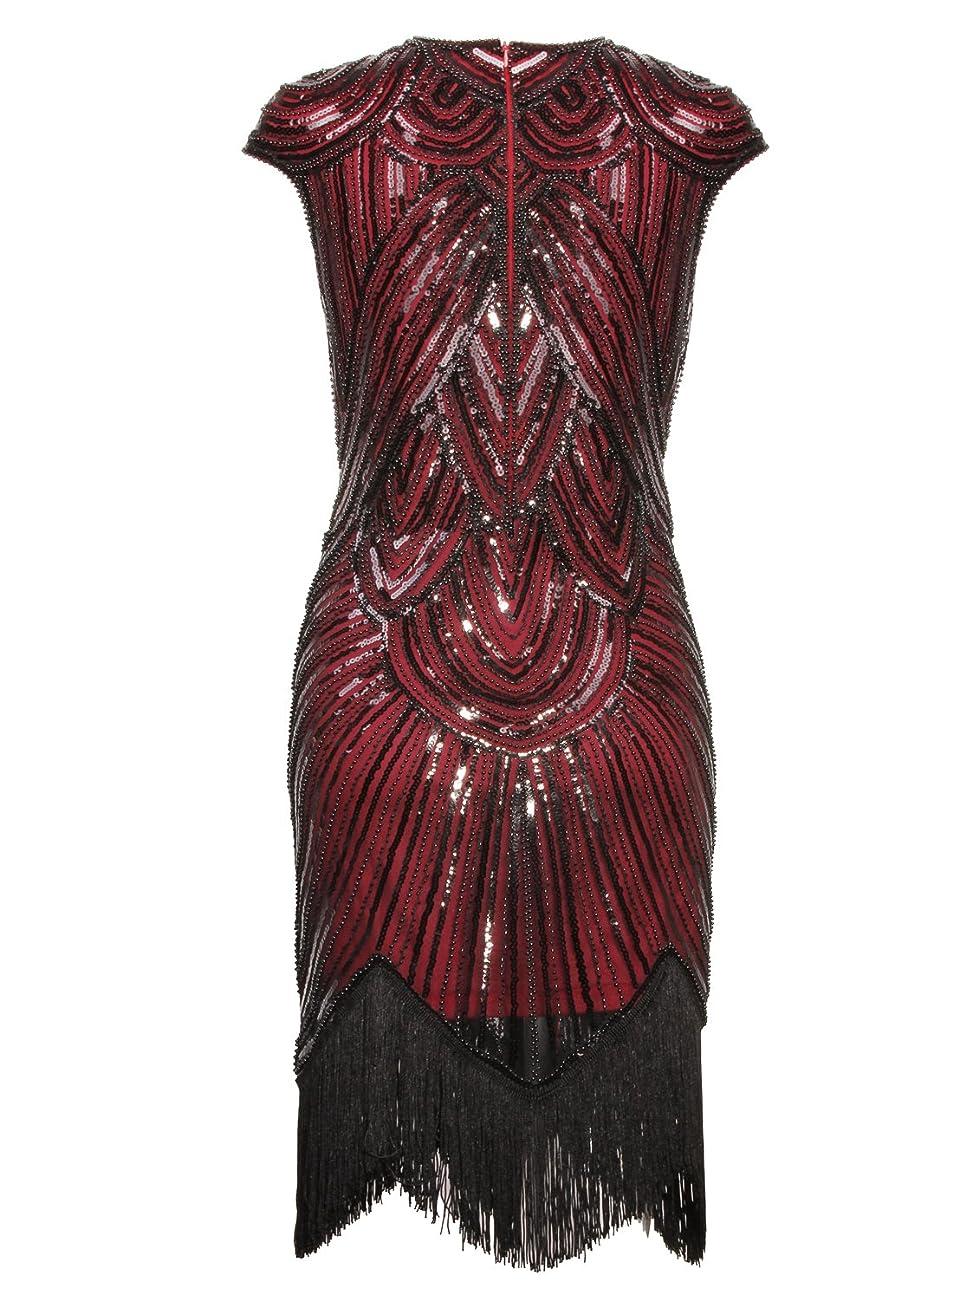 Vijiv Art Deco Great Gatsby Inspired Tassel Beaded 1920s Flapper Dress 2